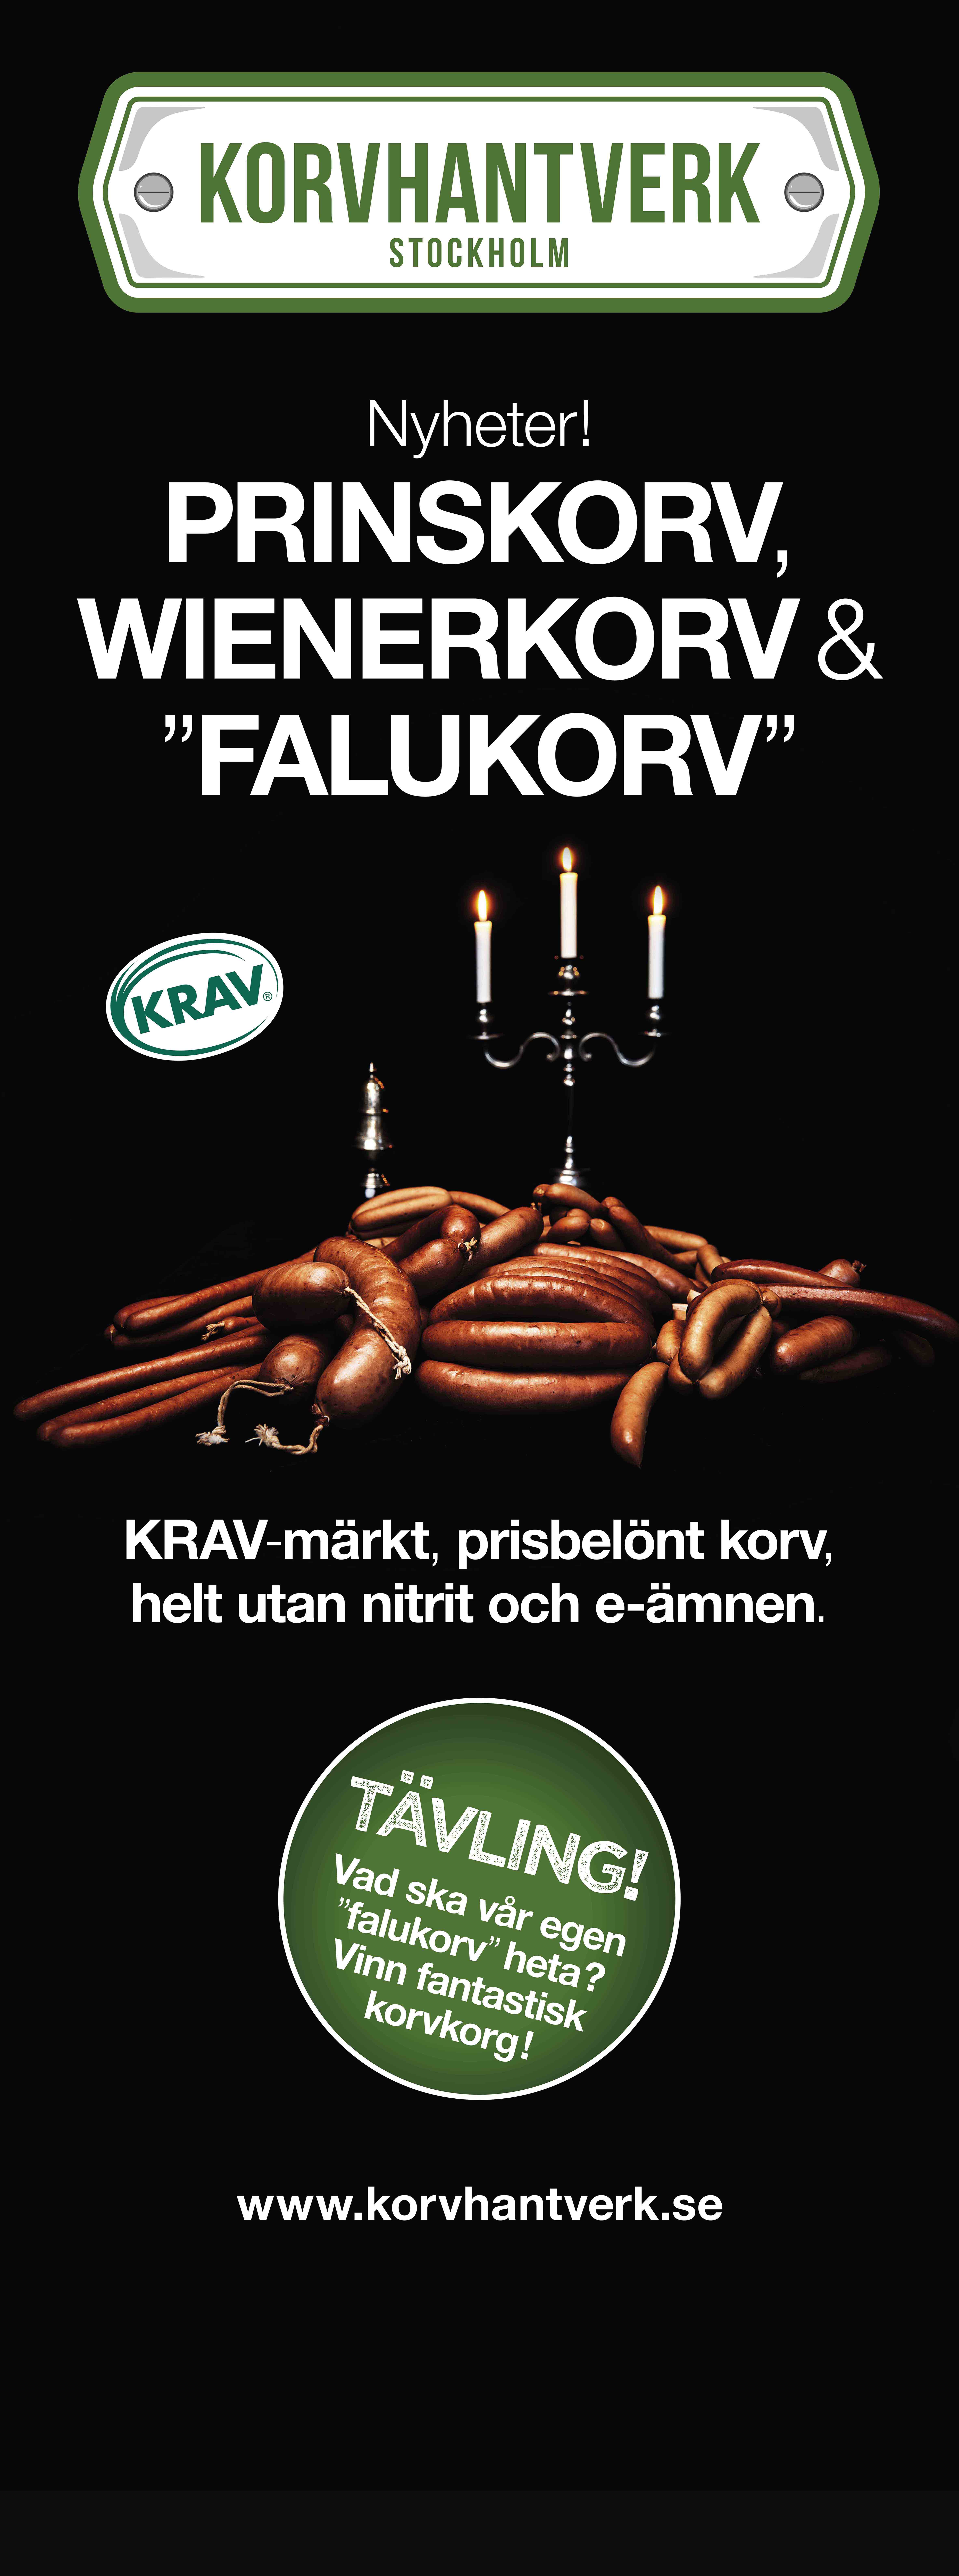 korvhantverk_rollup_3st_80X200_180226_skiss1.indd